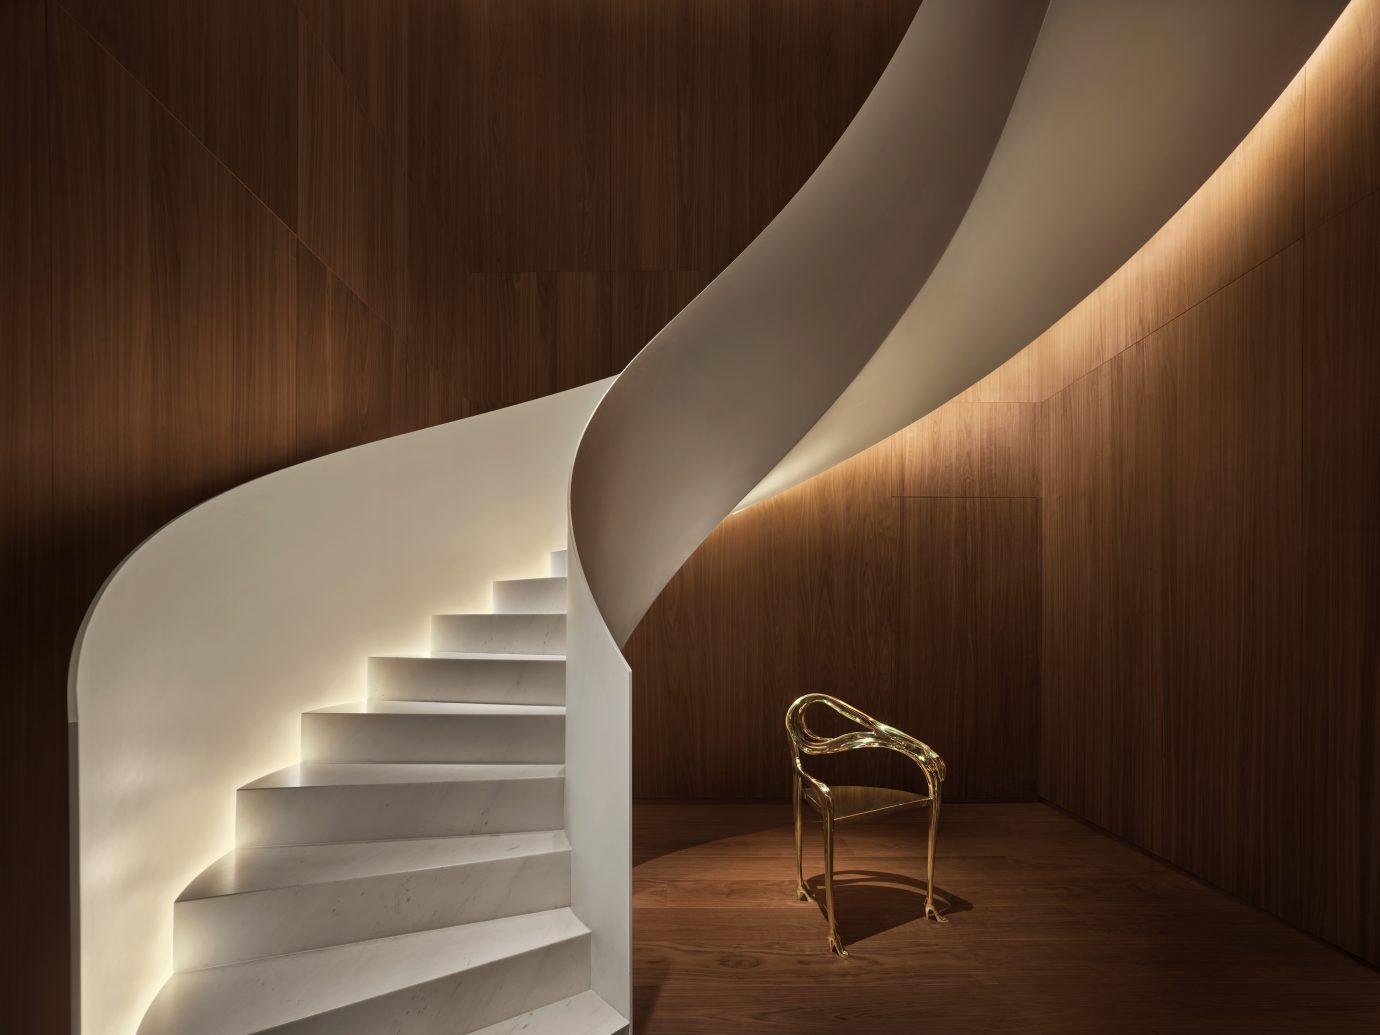 Barcelona EDITION staircase